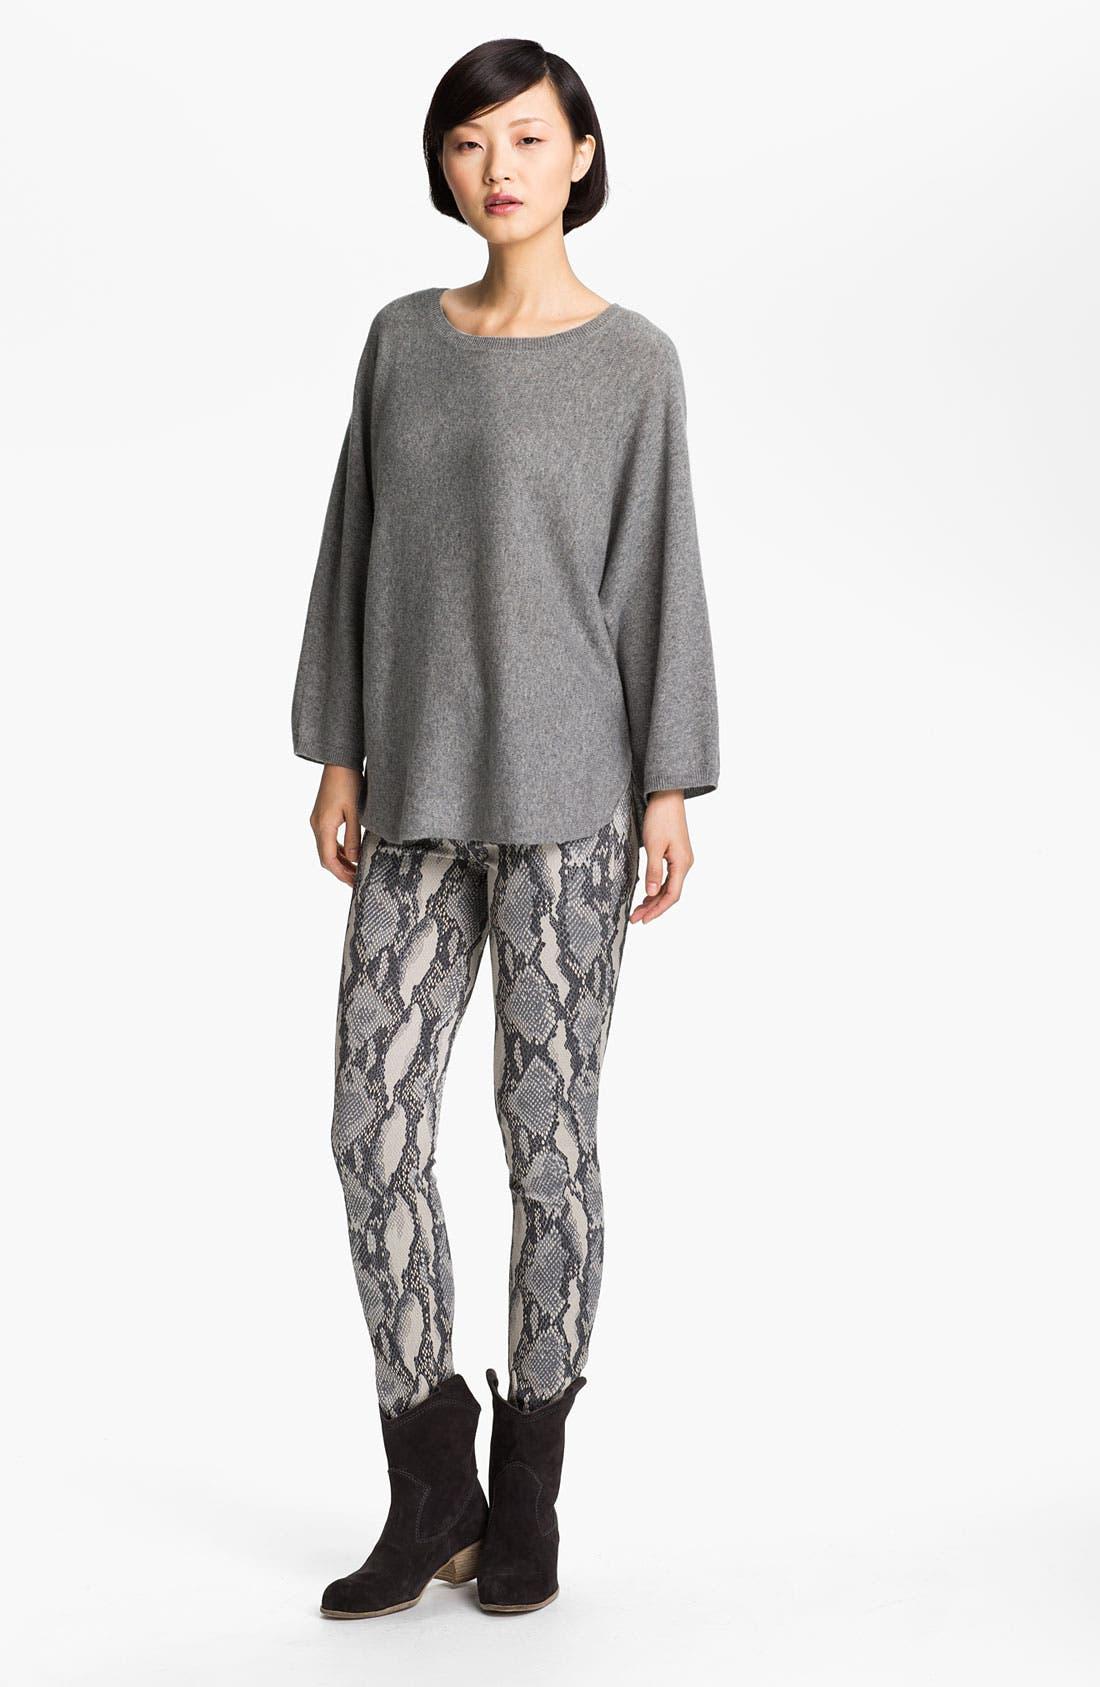 Alternate Image 1 Selected - Zadig & Voltaire 'Banko' Embellished Cashmere Sweater